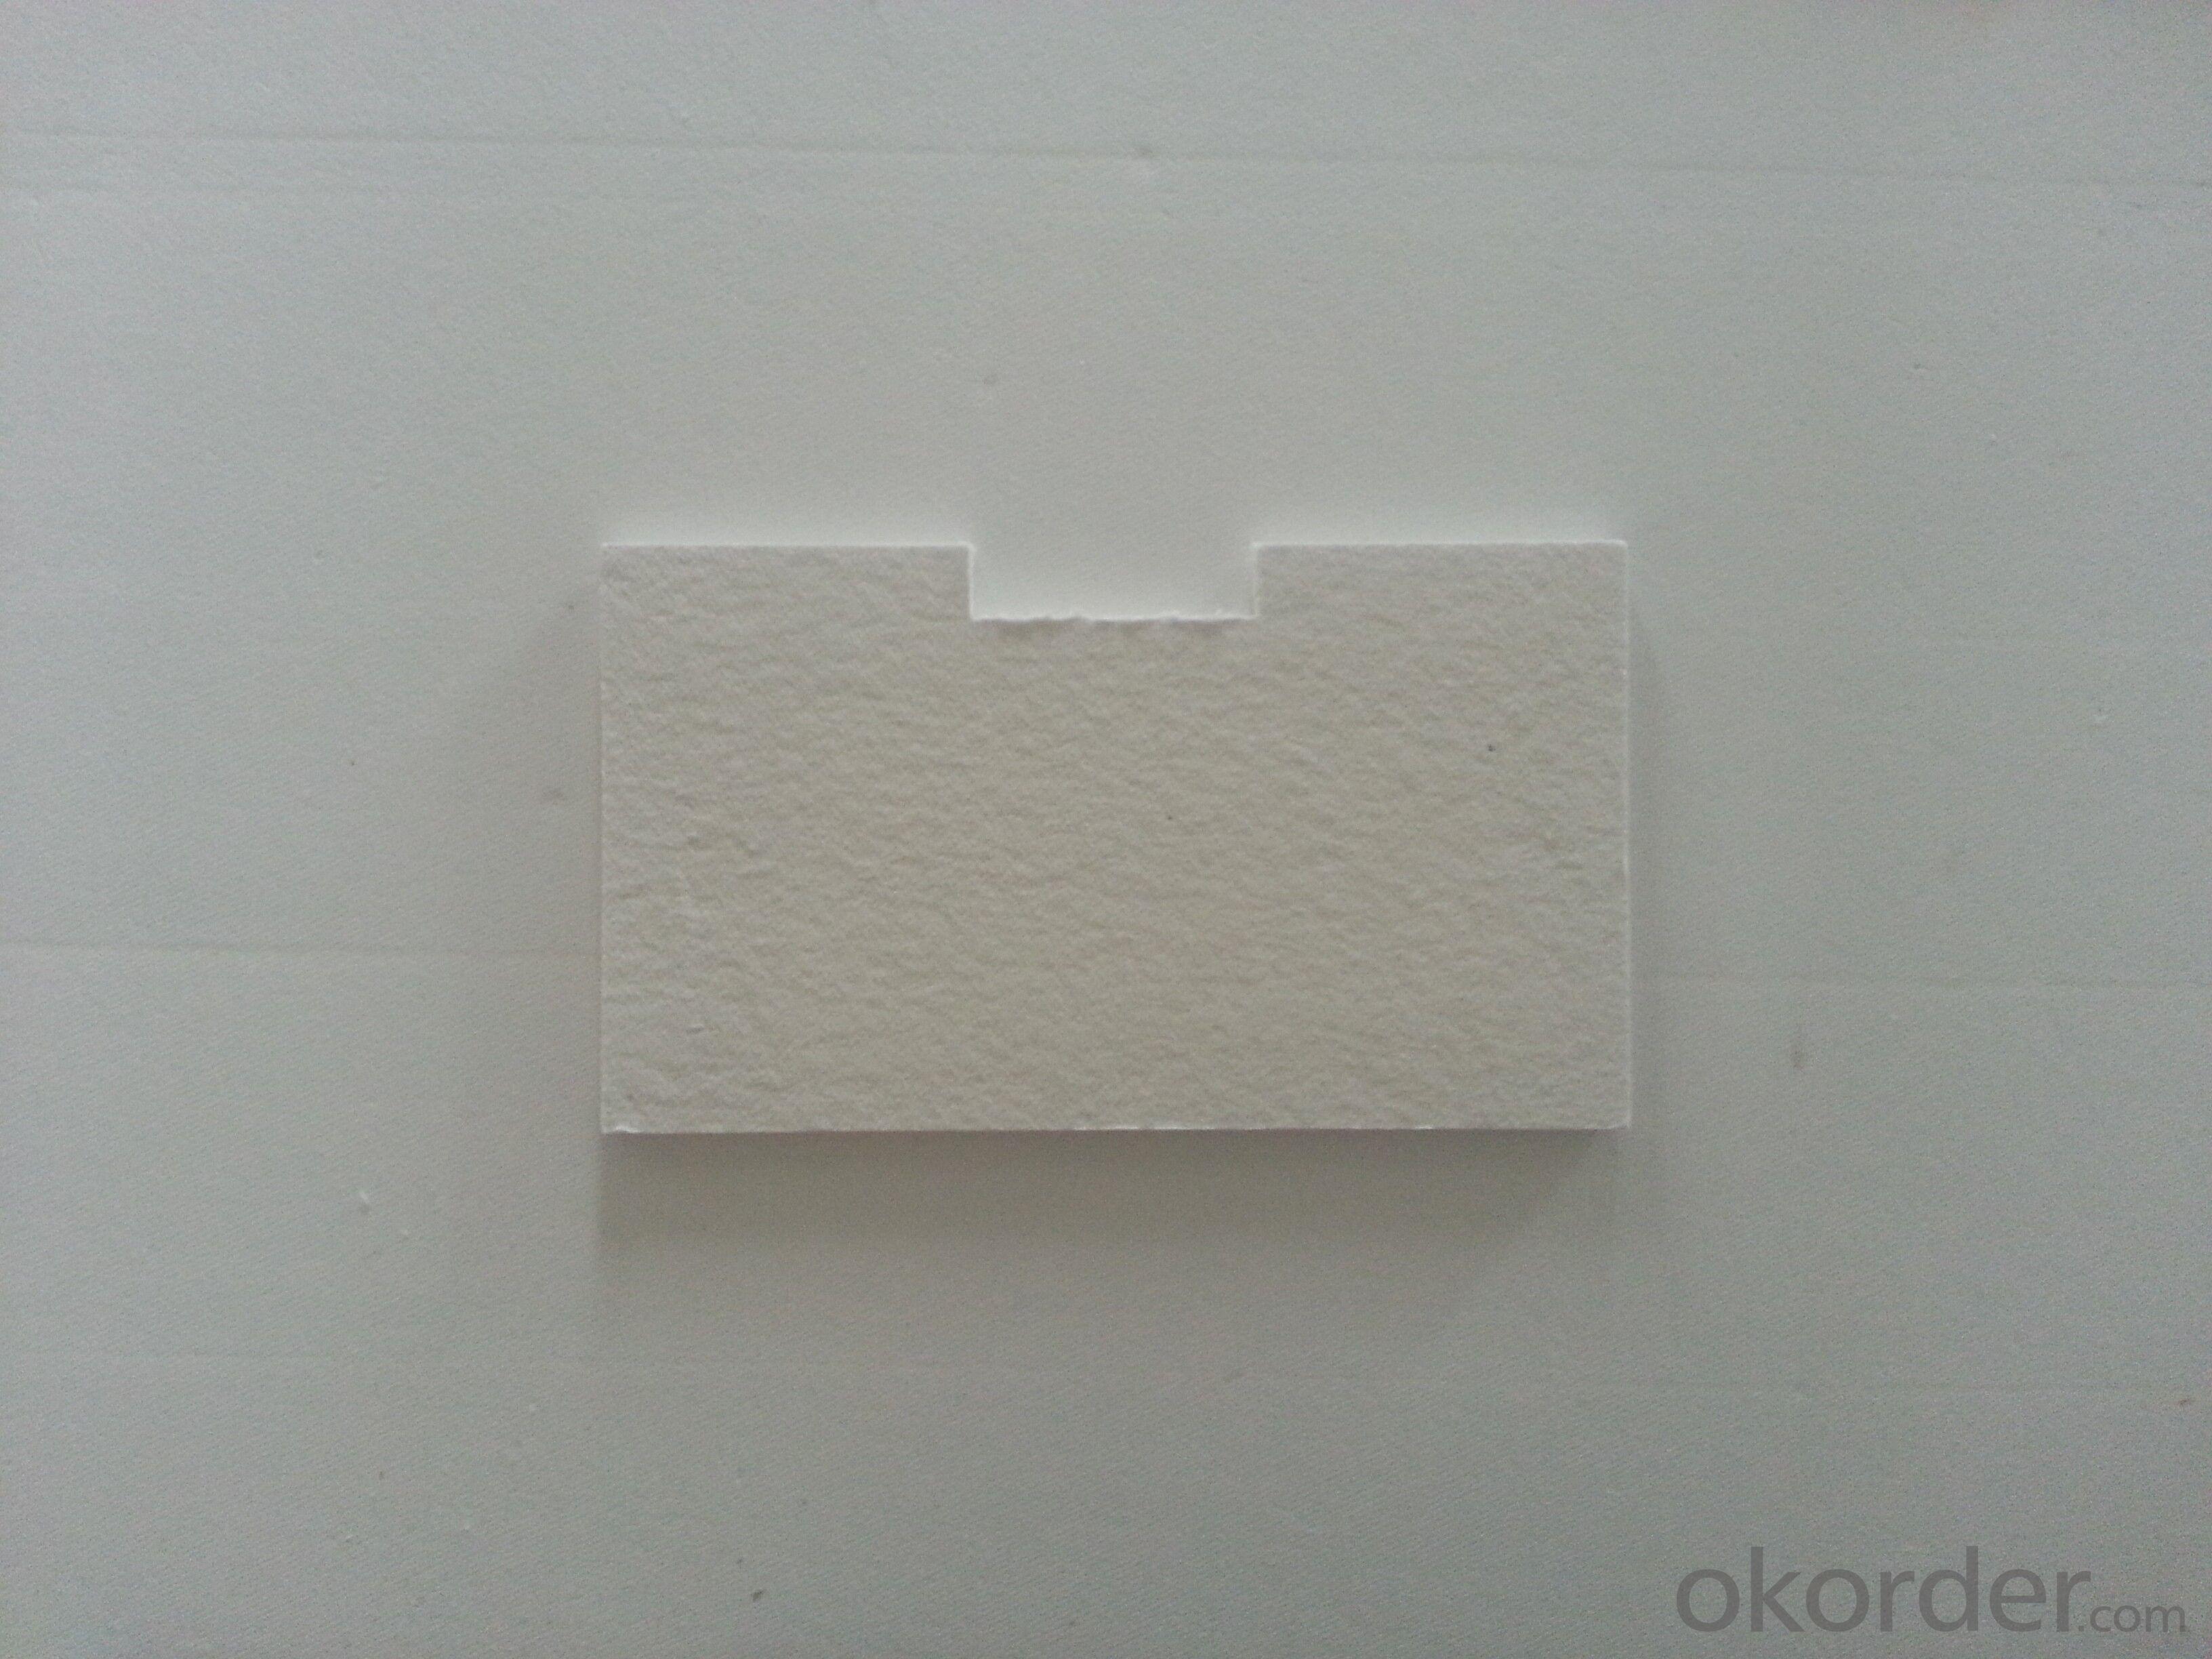 hot water heater used ceramic fiber board